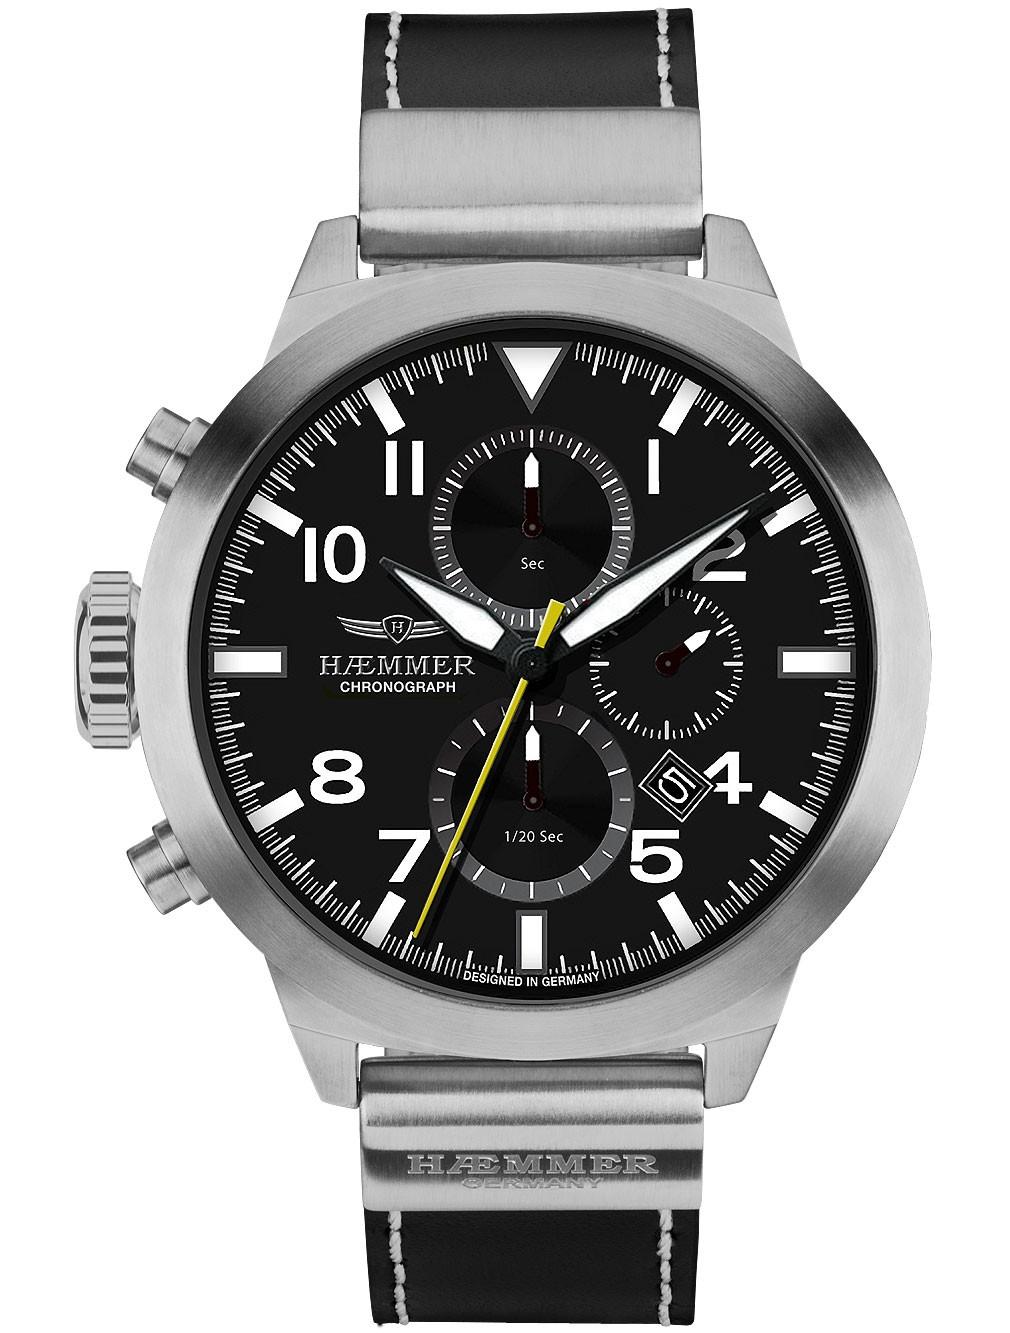 ceas barbatesc hemmer hf-01 authentic cronograf 50mm 10atm title=ceas barbatesc hemmer hf-01 authentic cronograf 50mm 10atm